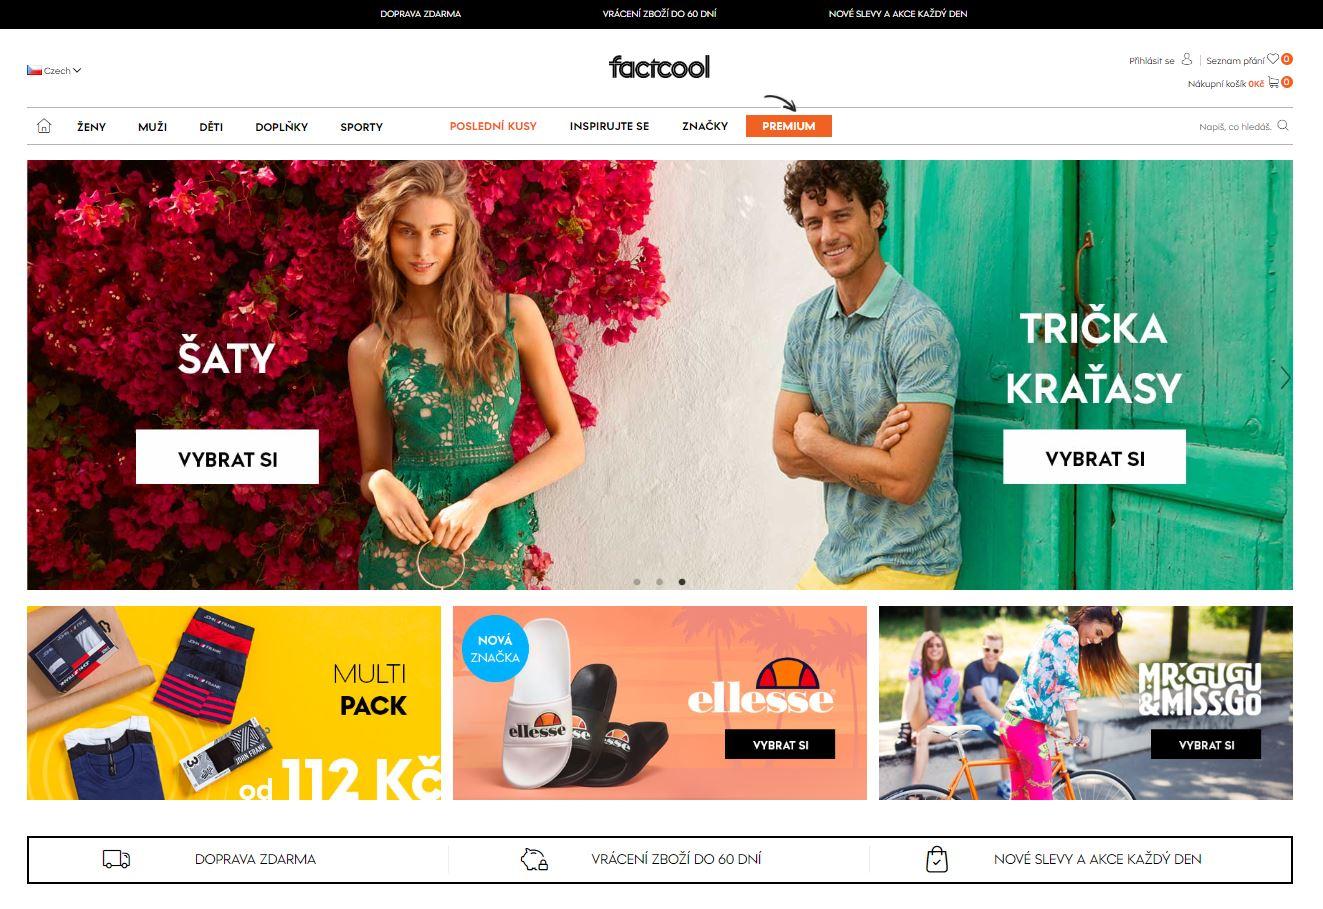 internetový obchod factcool.com